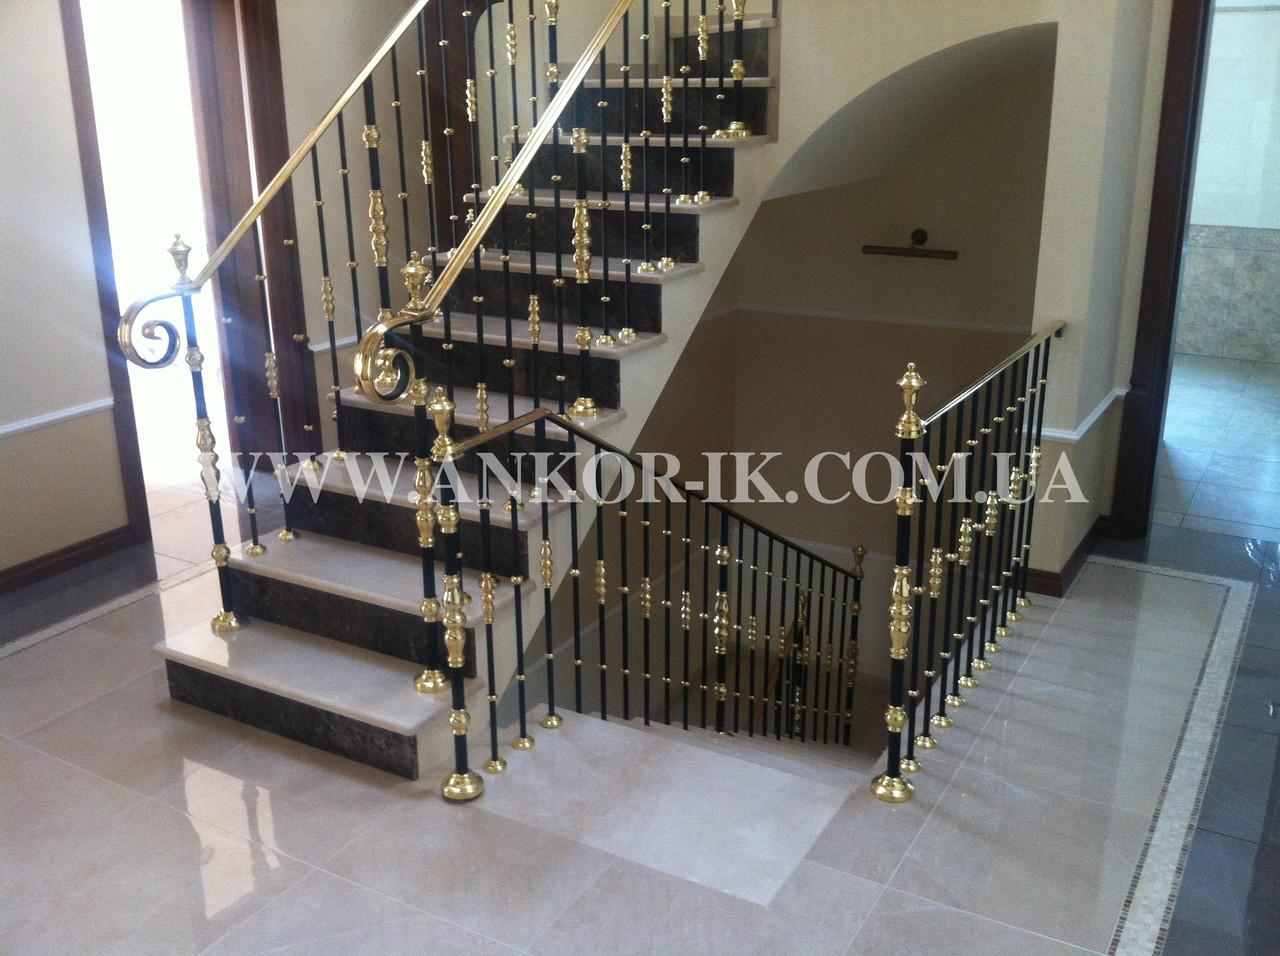 Изготовление лестниц из мрамора, гранита